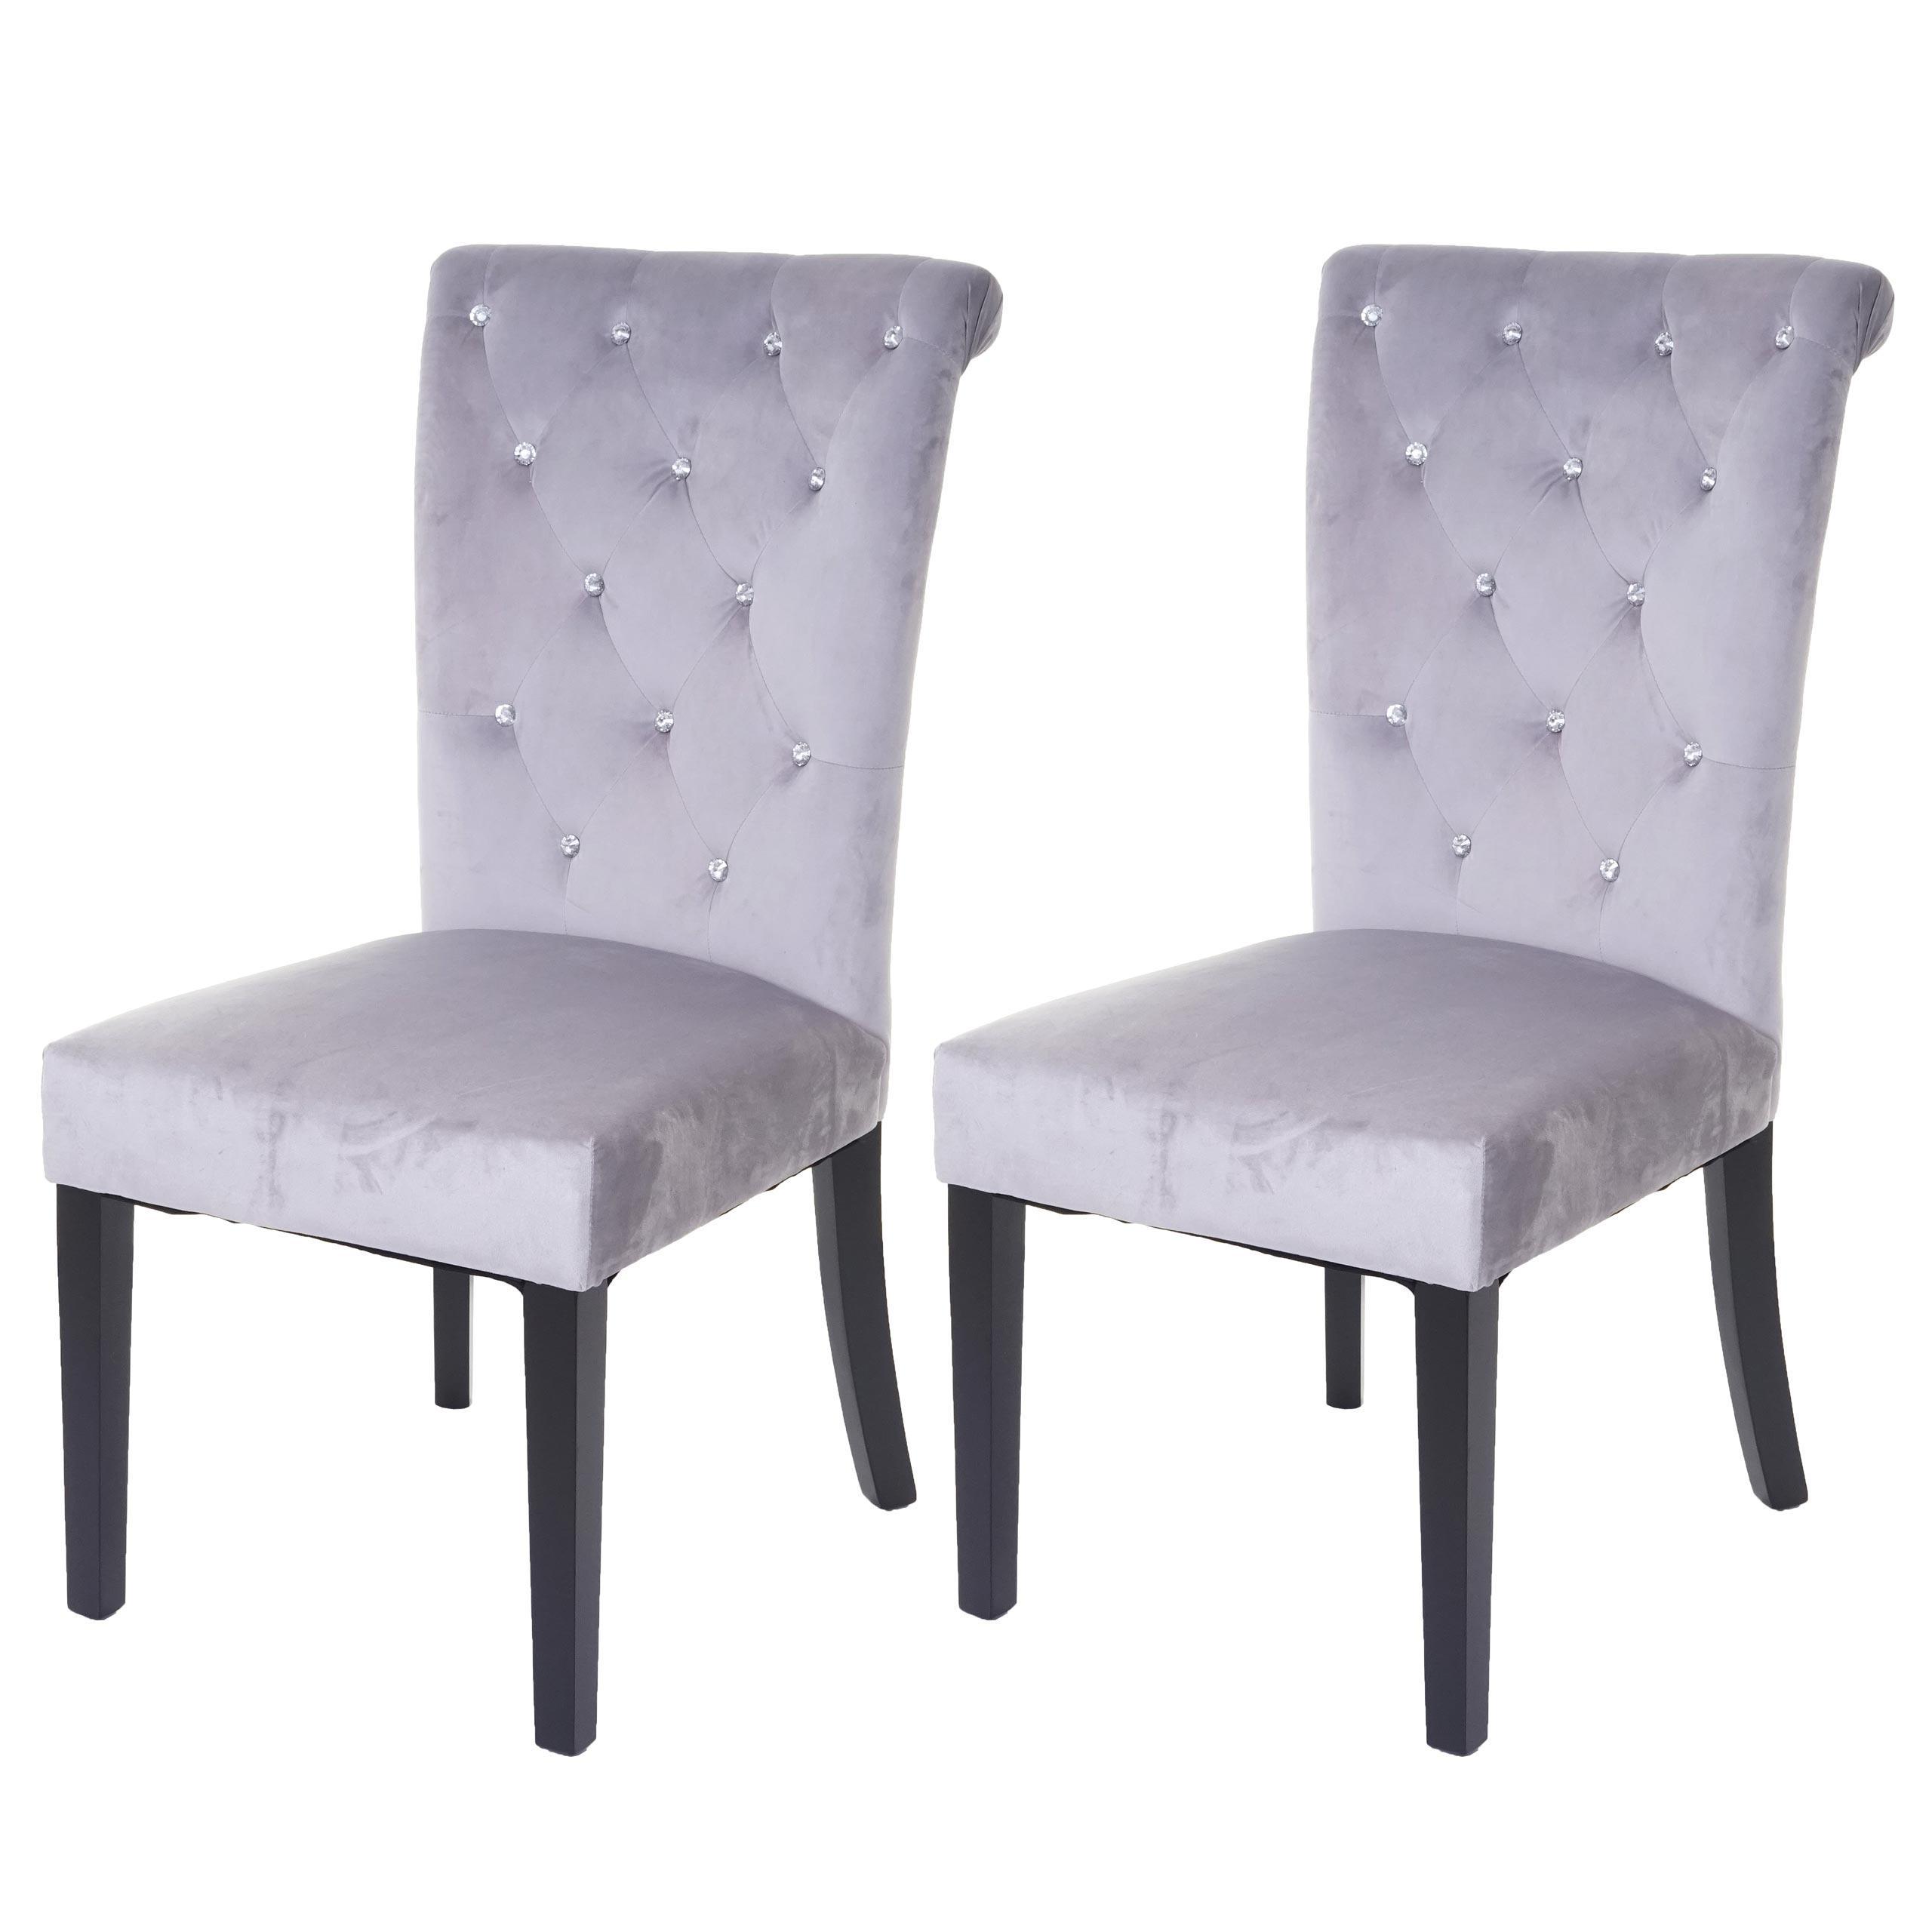 Samt Stuhl Grau Schwarz